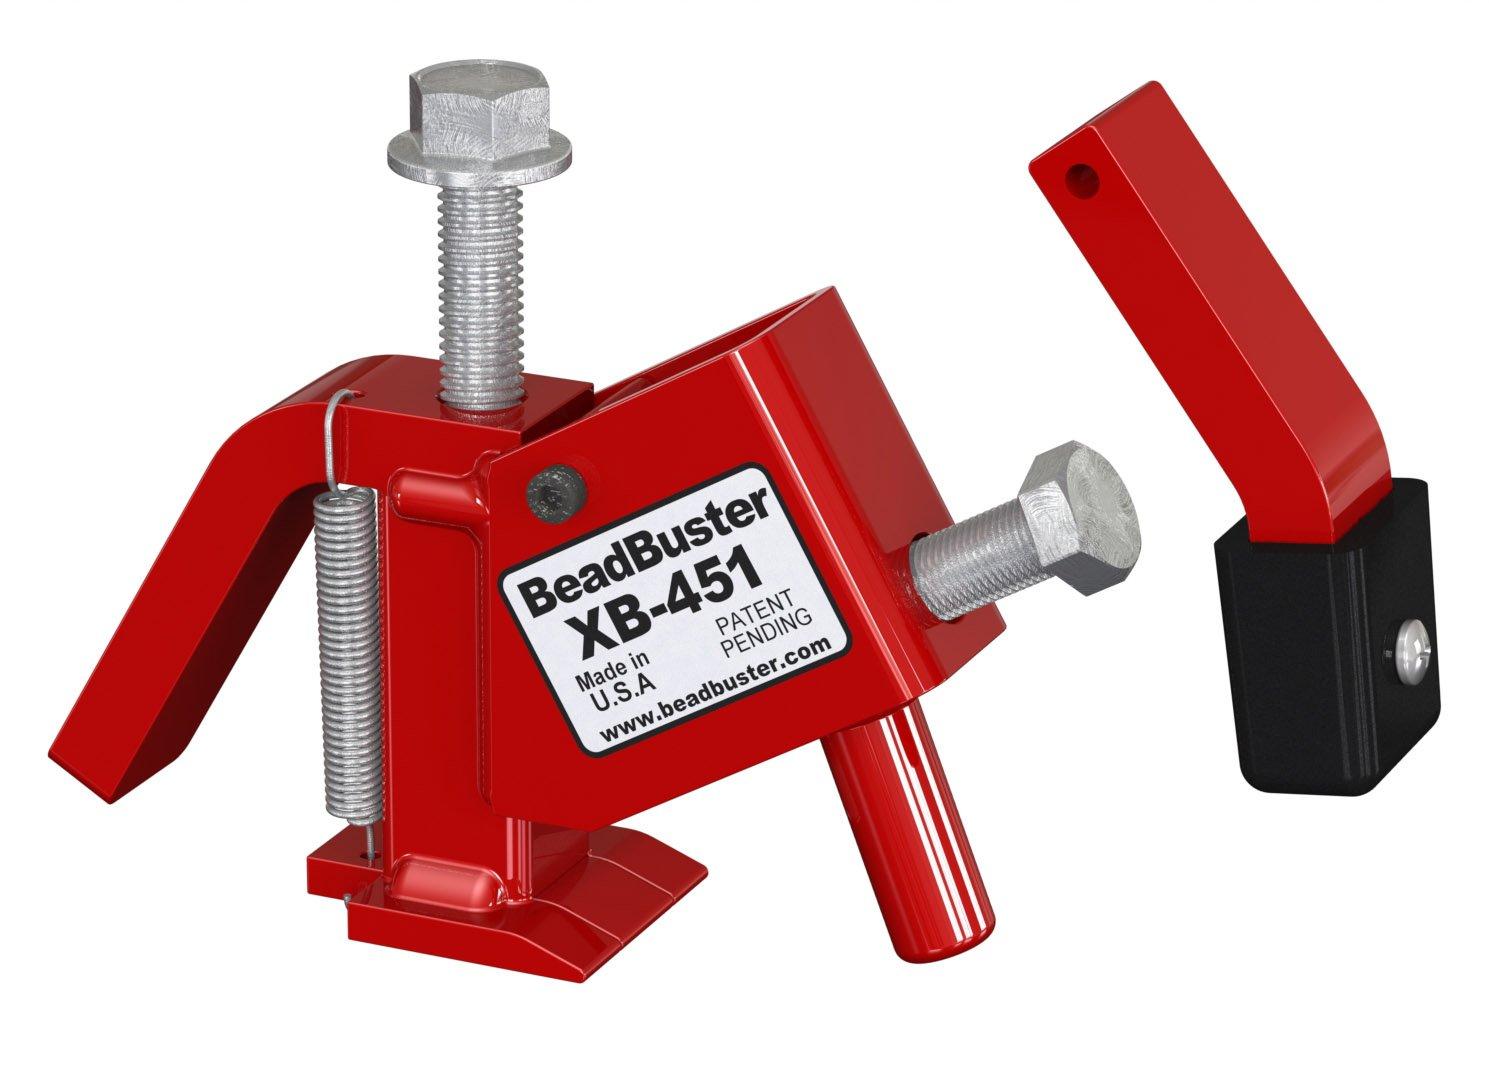 BeadBuster XB-451 ATV (Reinforced Rims) / Motorcycle/Car Tire Bead Breaker Tool by BeadBuster